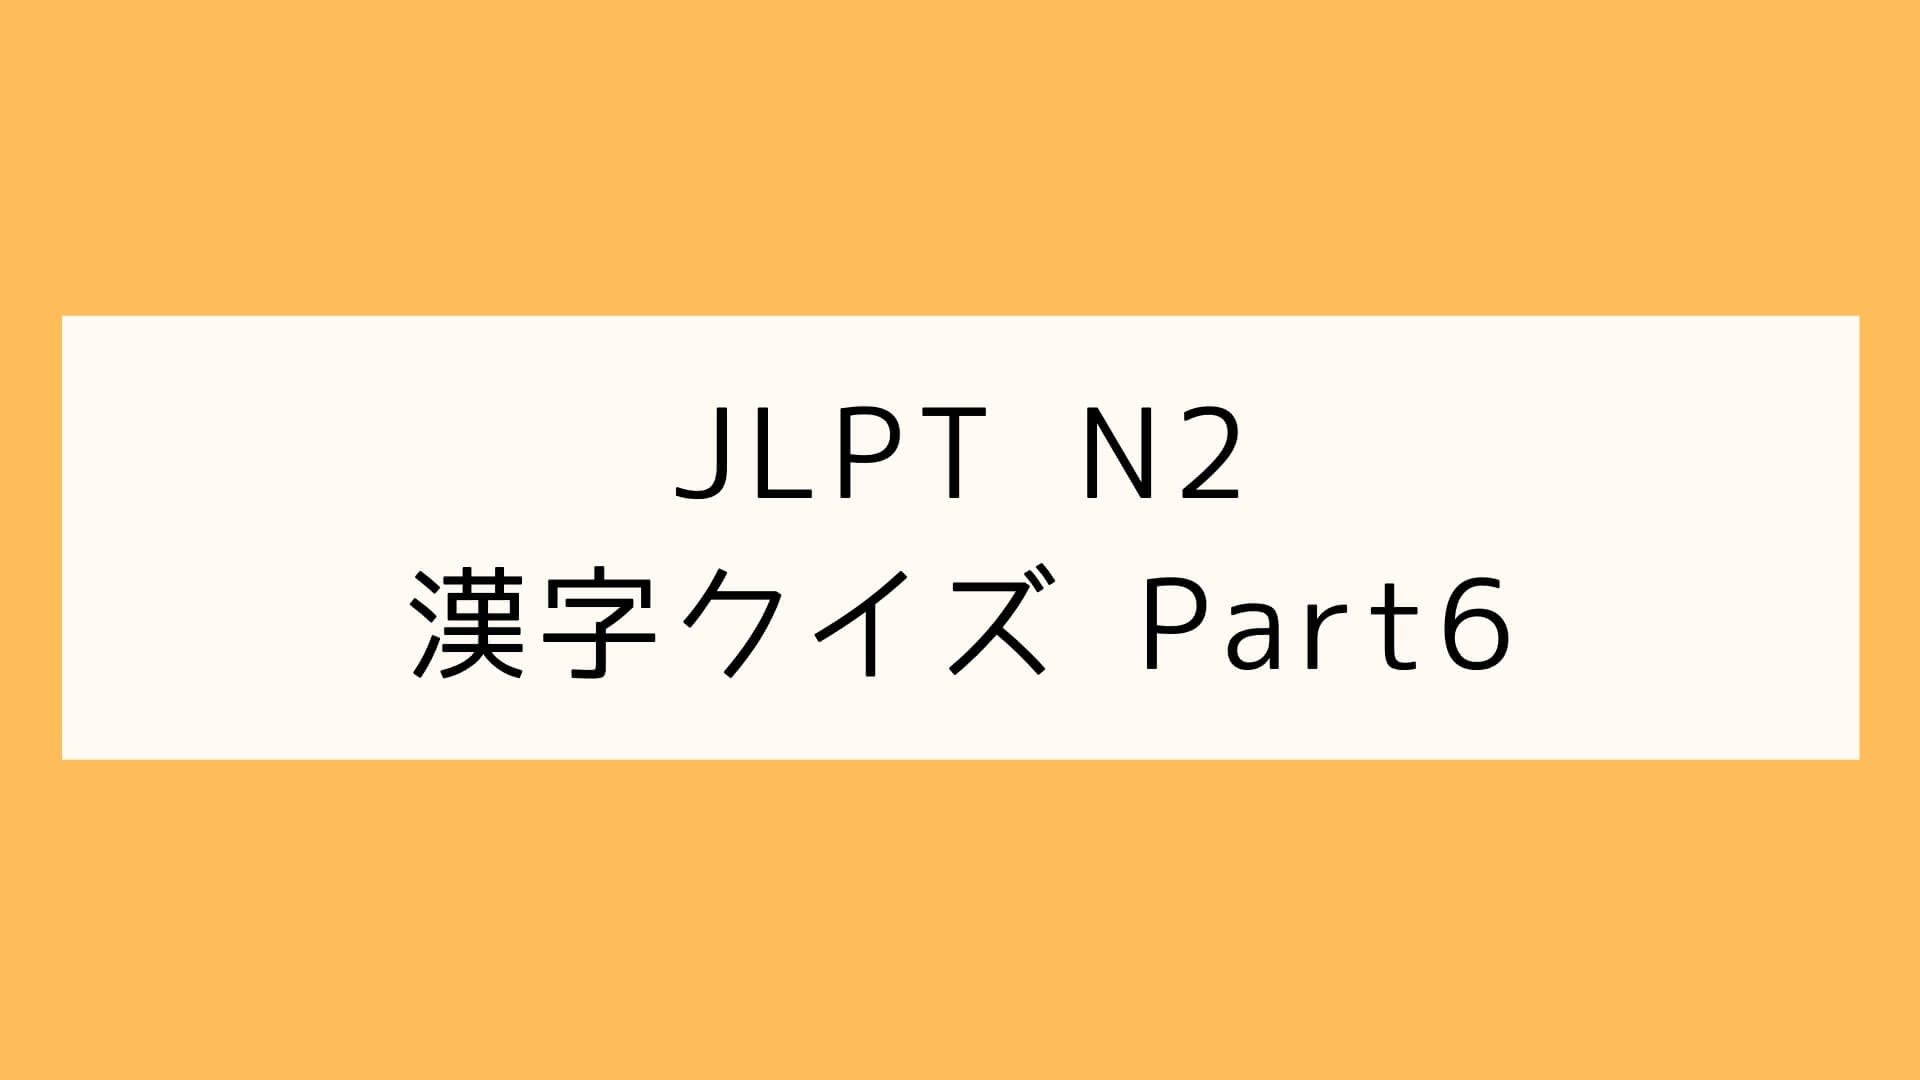 【JLPT N2】漢字クイズ Part6